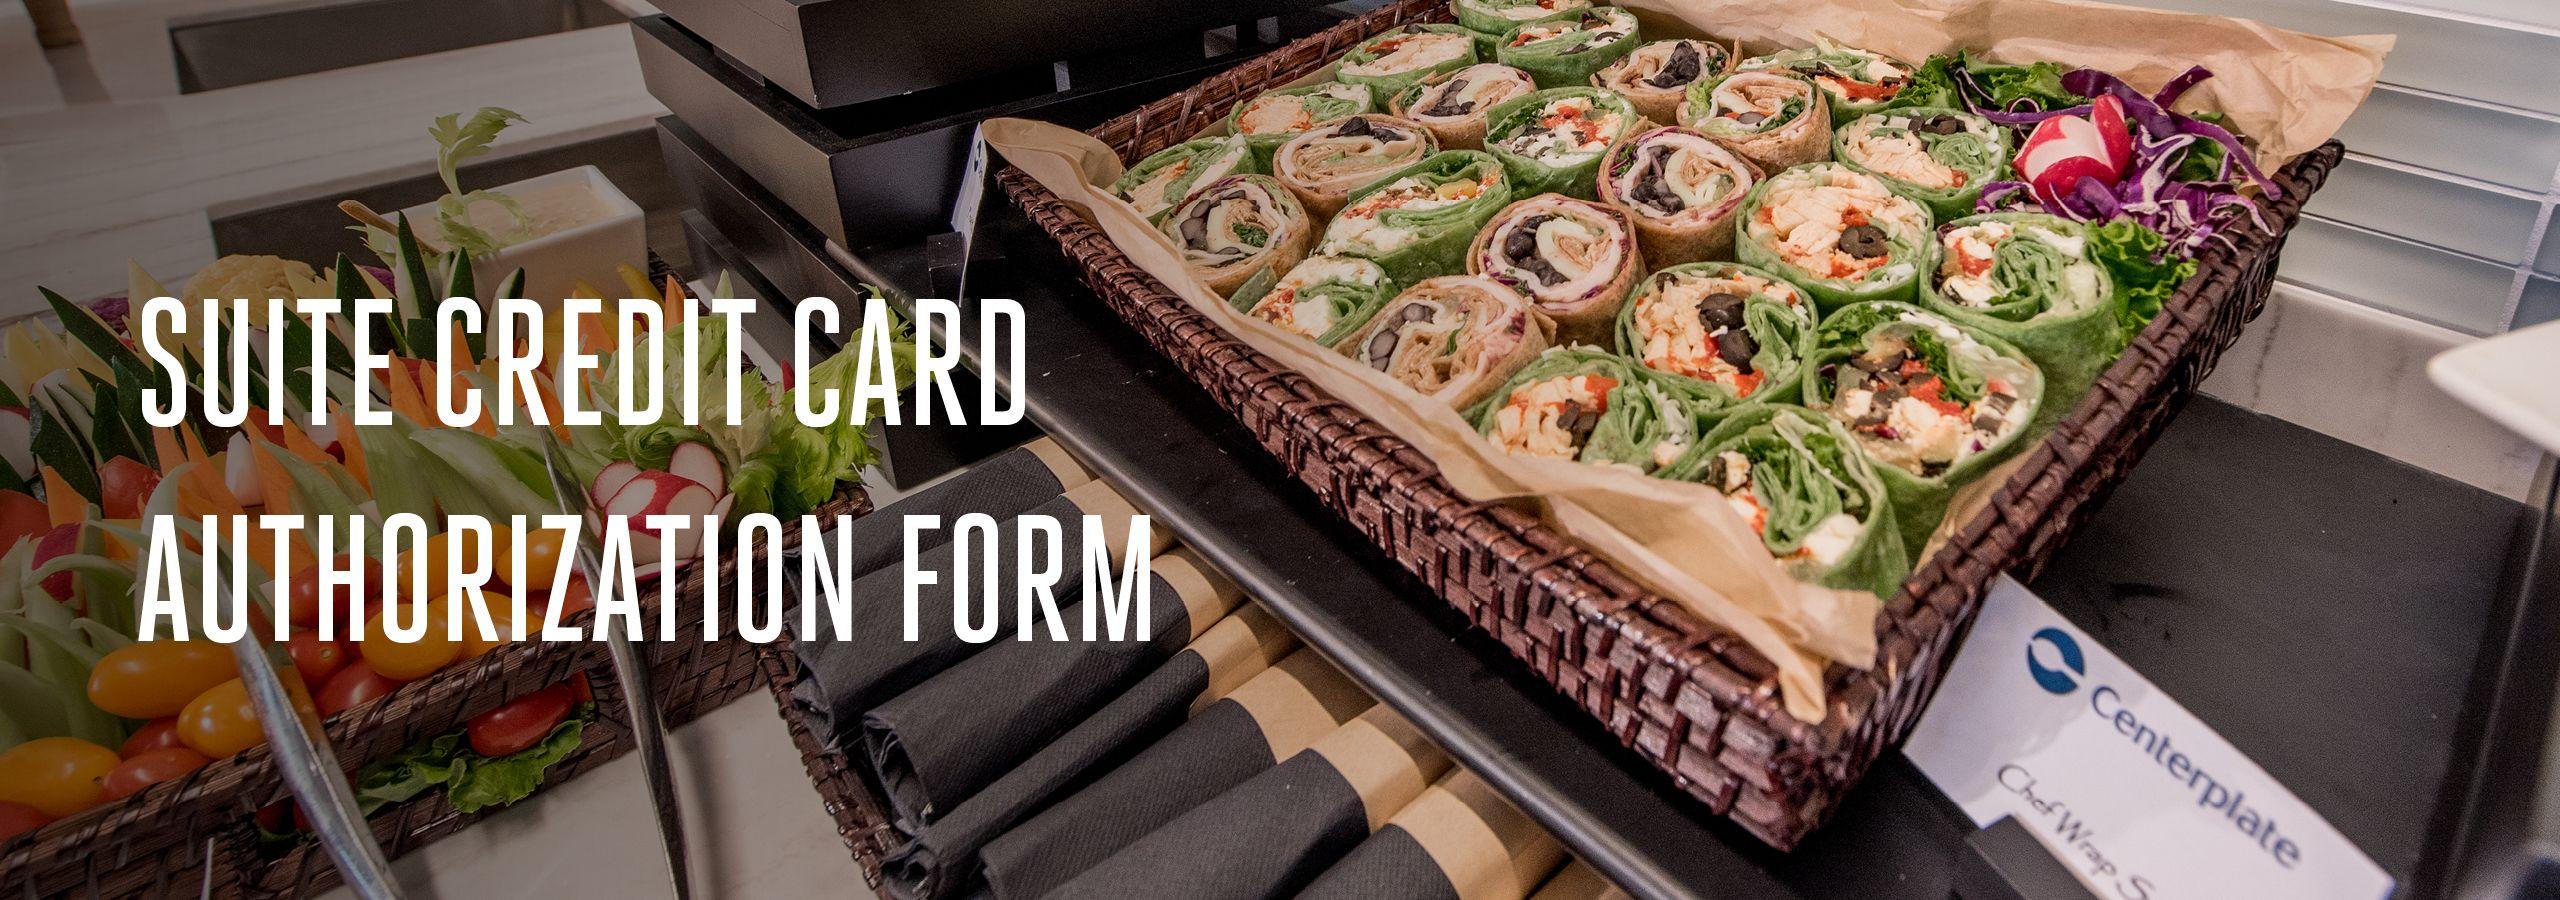 SUITE_CREDIT_CARD_AUTHORIZATION_FORM